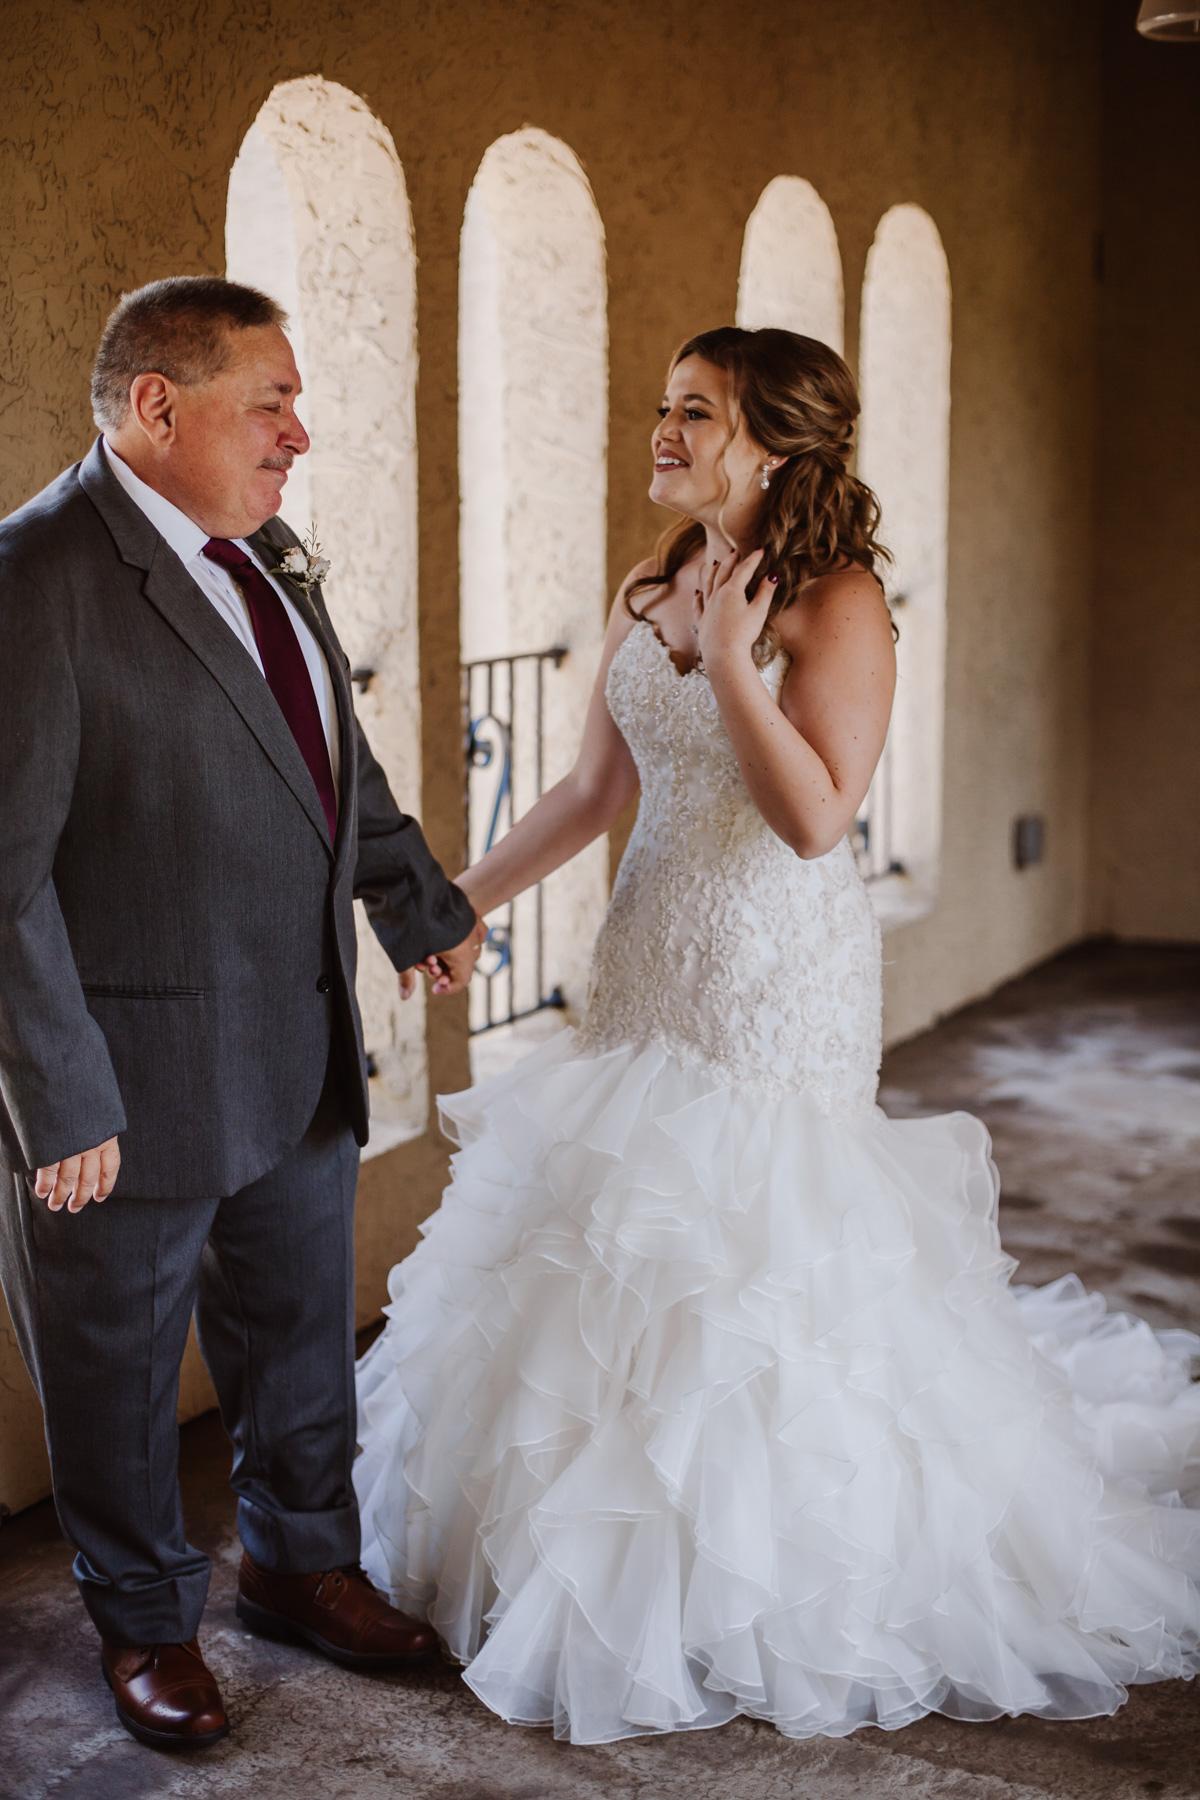 Bella Collina wedding | father and bride/daughter first look | Kayli LaFon Photography, Greensboro Winston-Salem NC Photographer